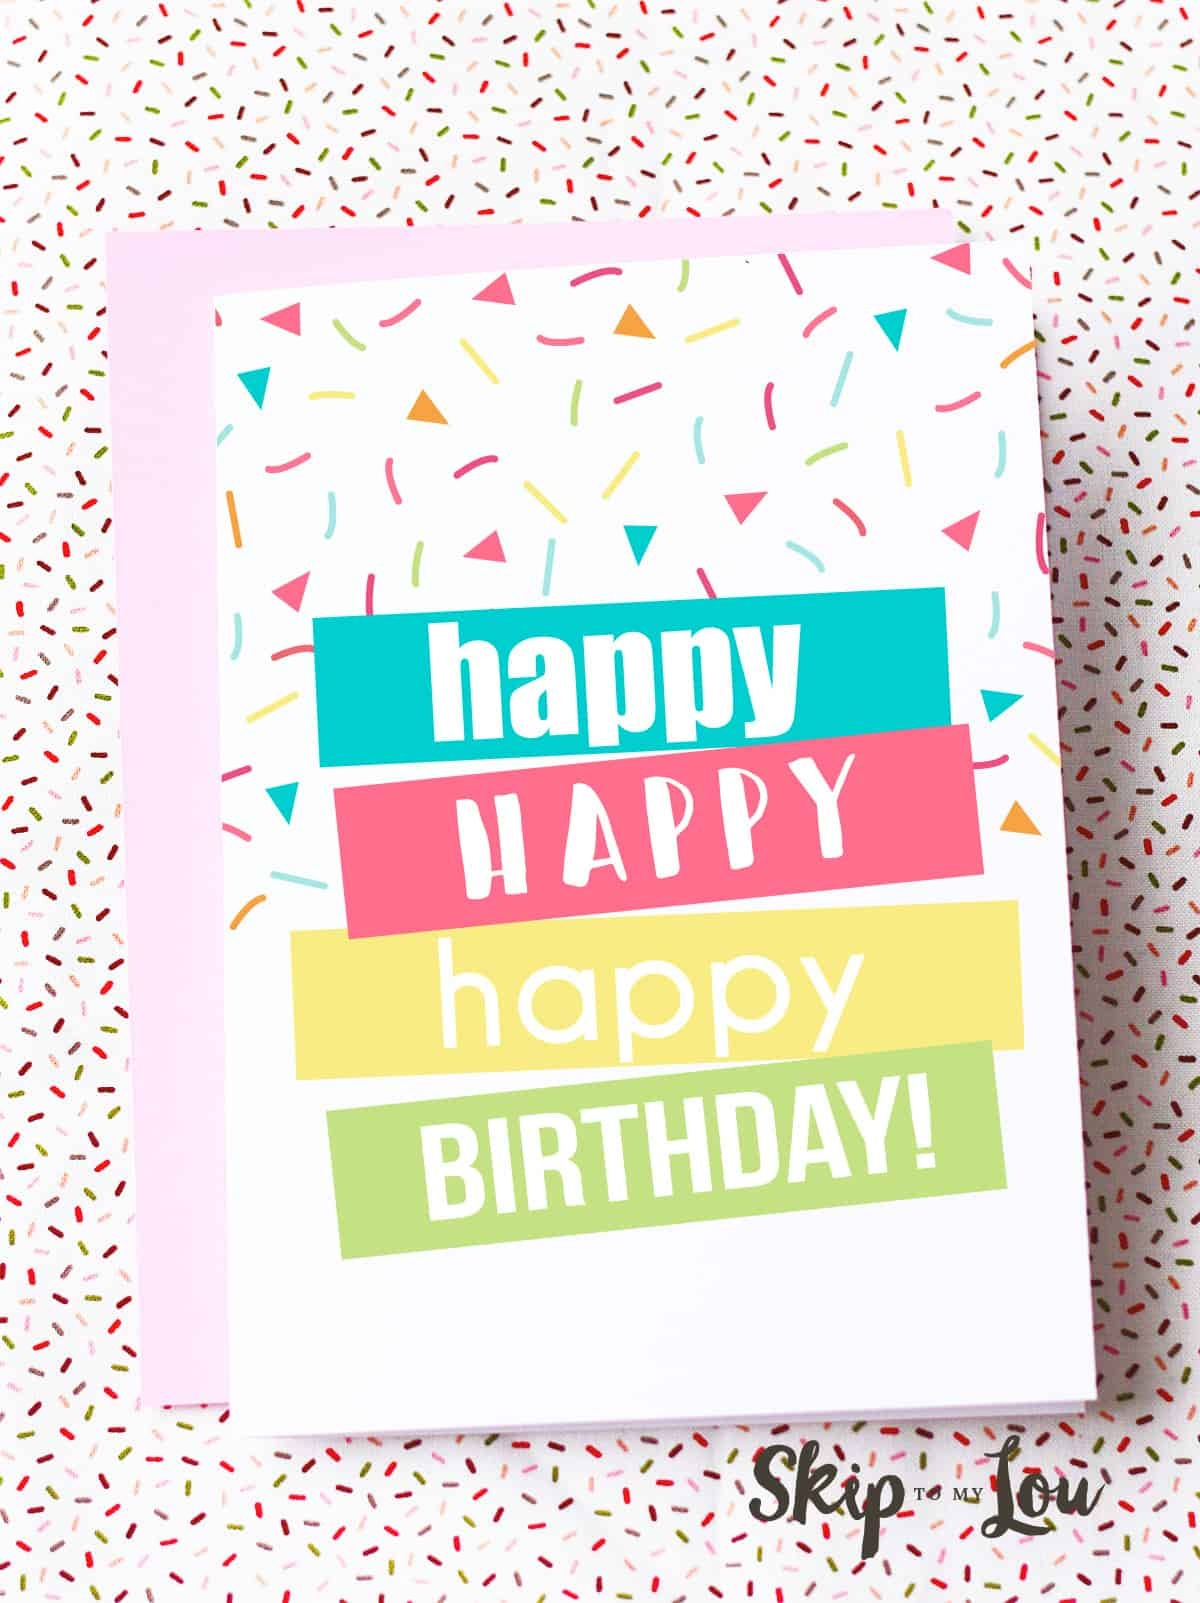 Free Printable Birthday Cards   Skip To My Lou - Happy Birthday Free Cards Printable